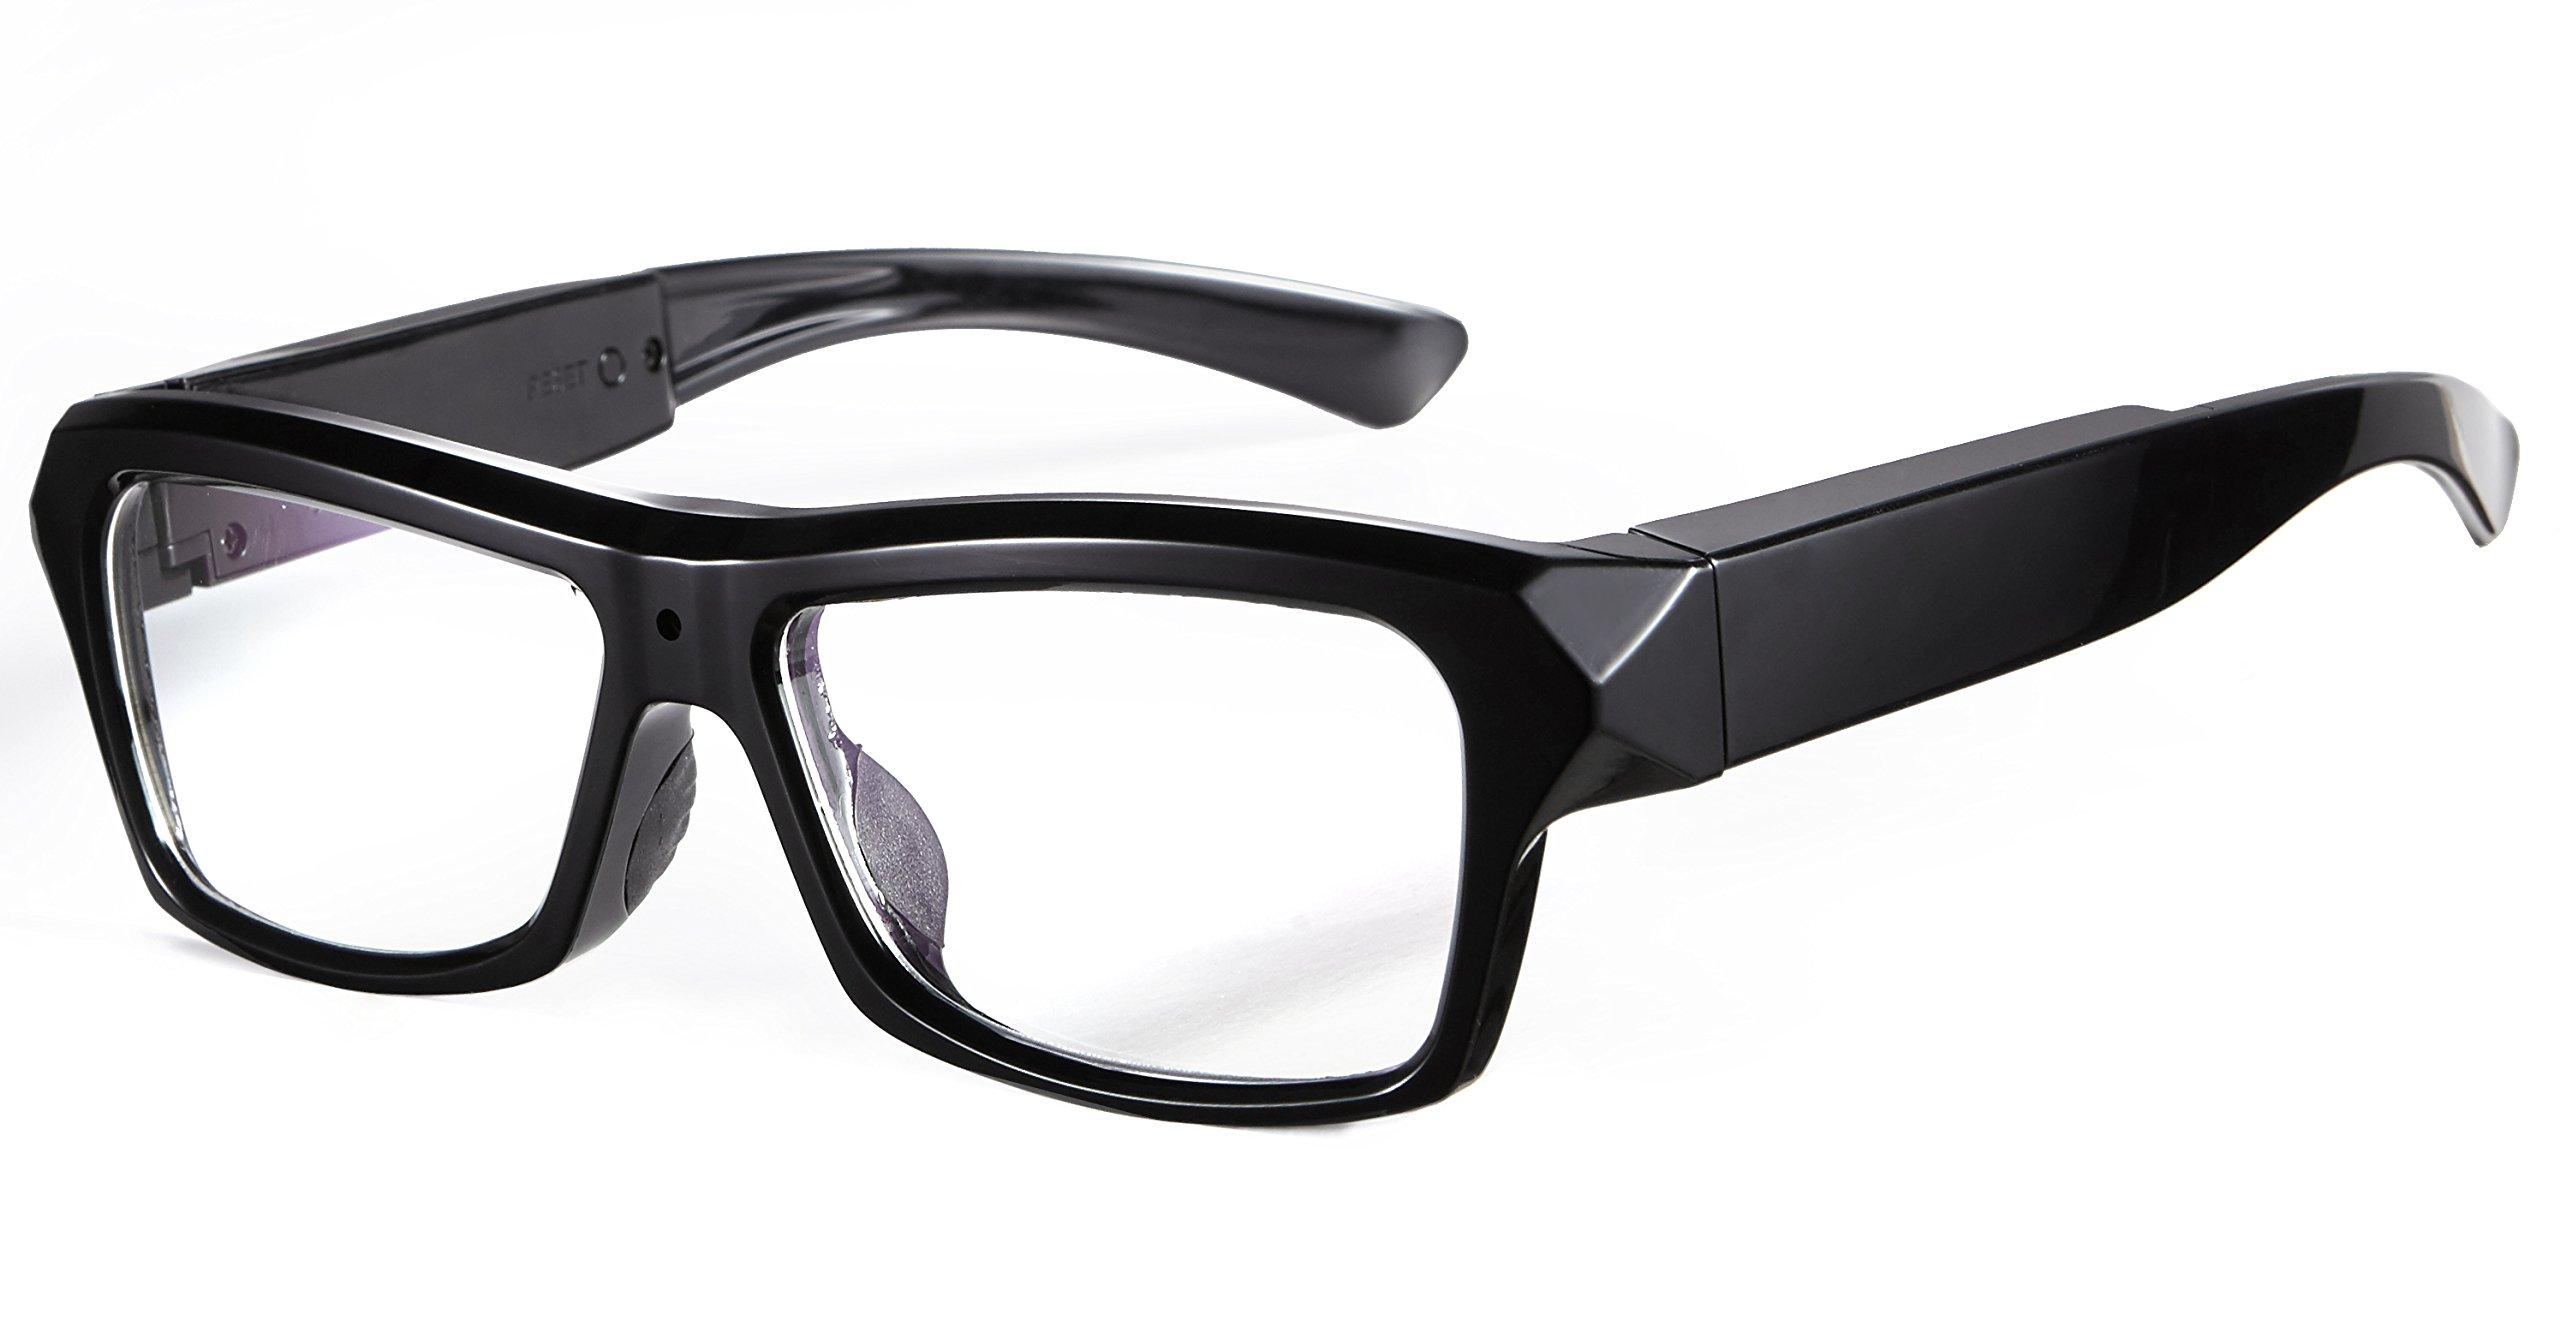 Forestfish Video Camera Eyeglasses Video Recording Camera Glasses Sunglasses Camera 16GB SD Card HD 720P DVR Video Recorder by Forestfish